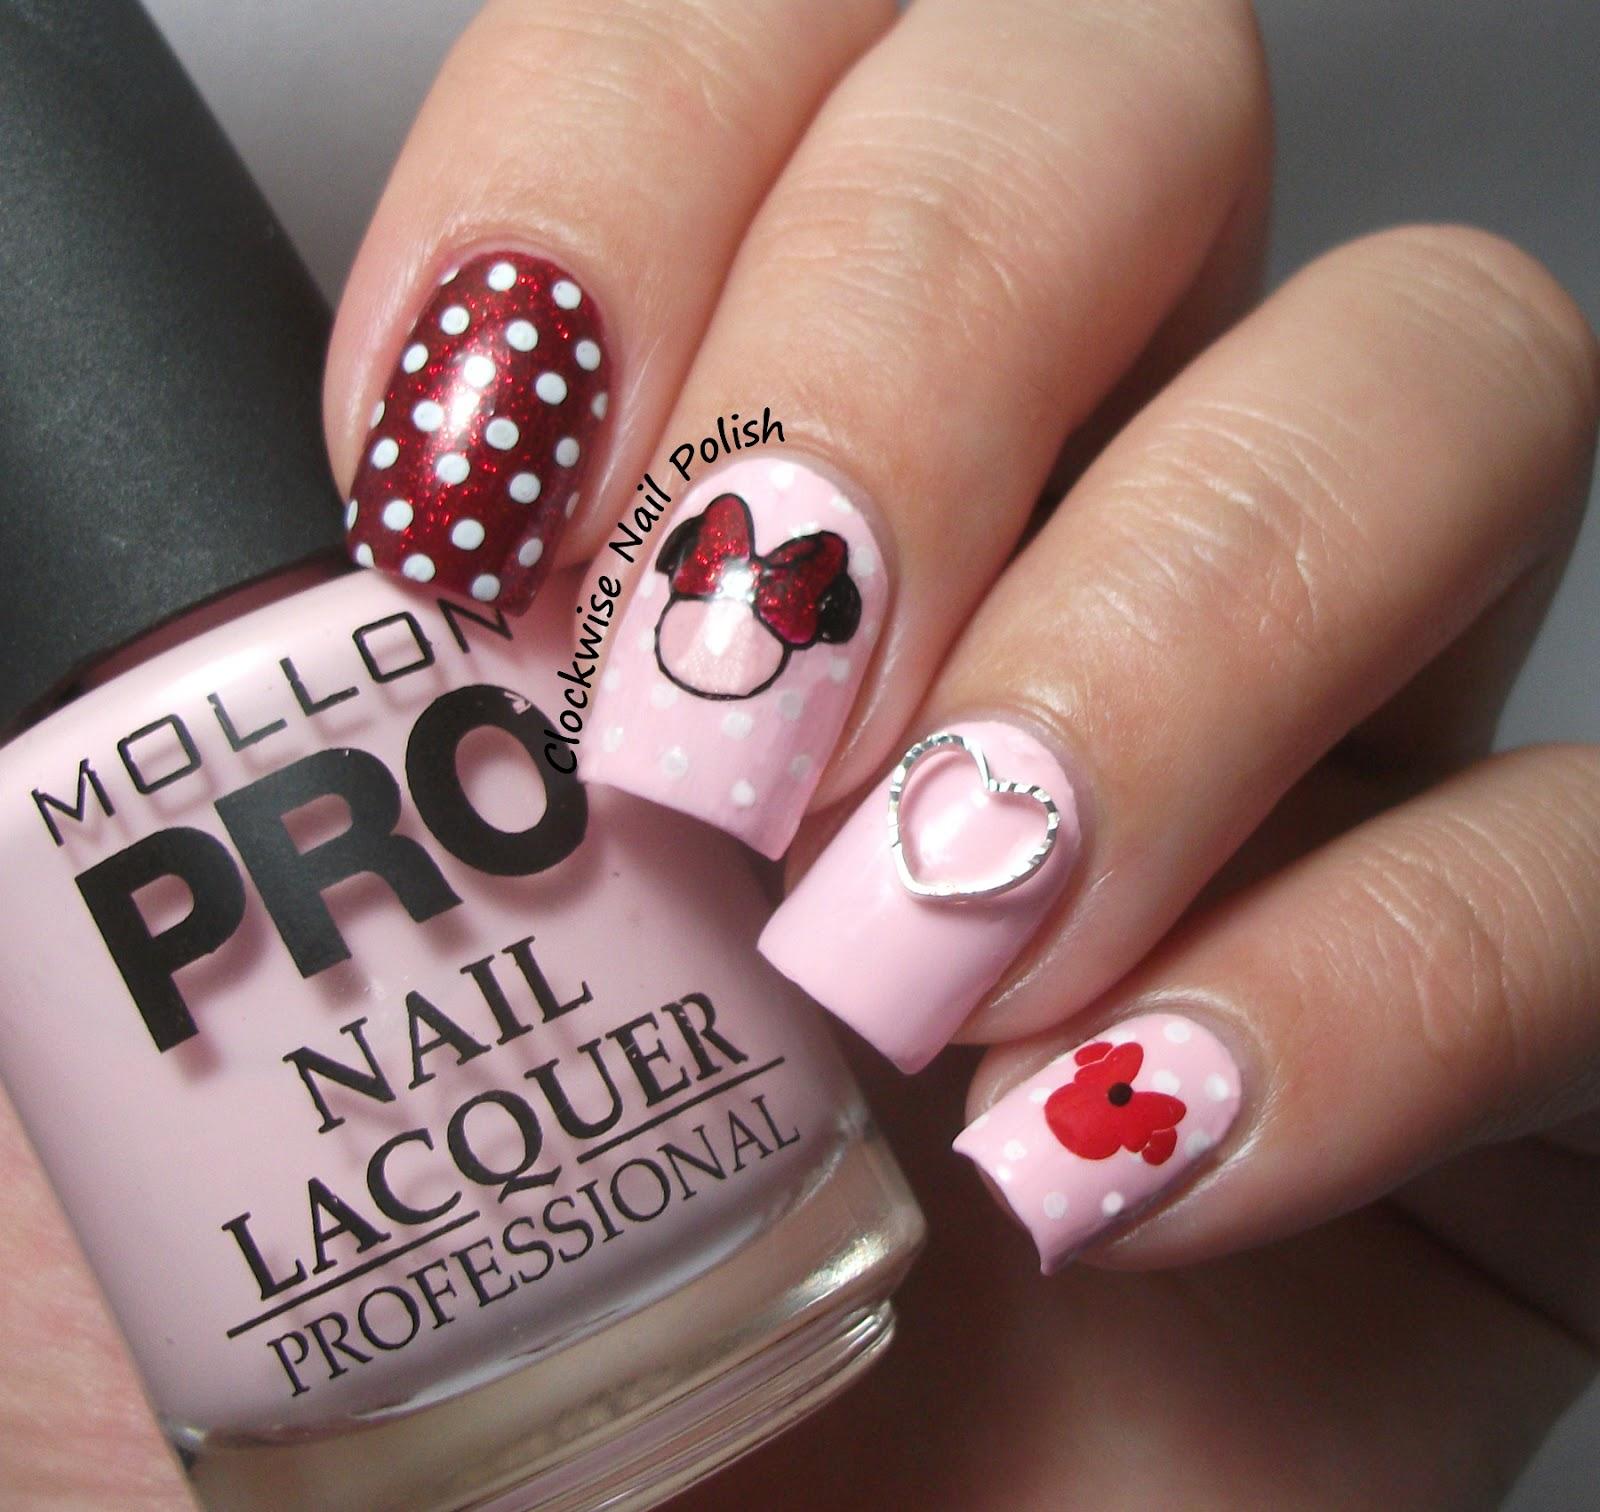 The clockwise nail polish mollon pro 180 amor mini nail art a prinsesfo Images